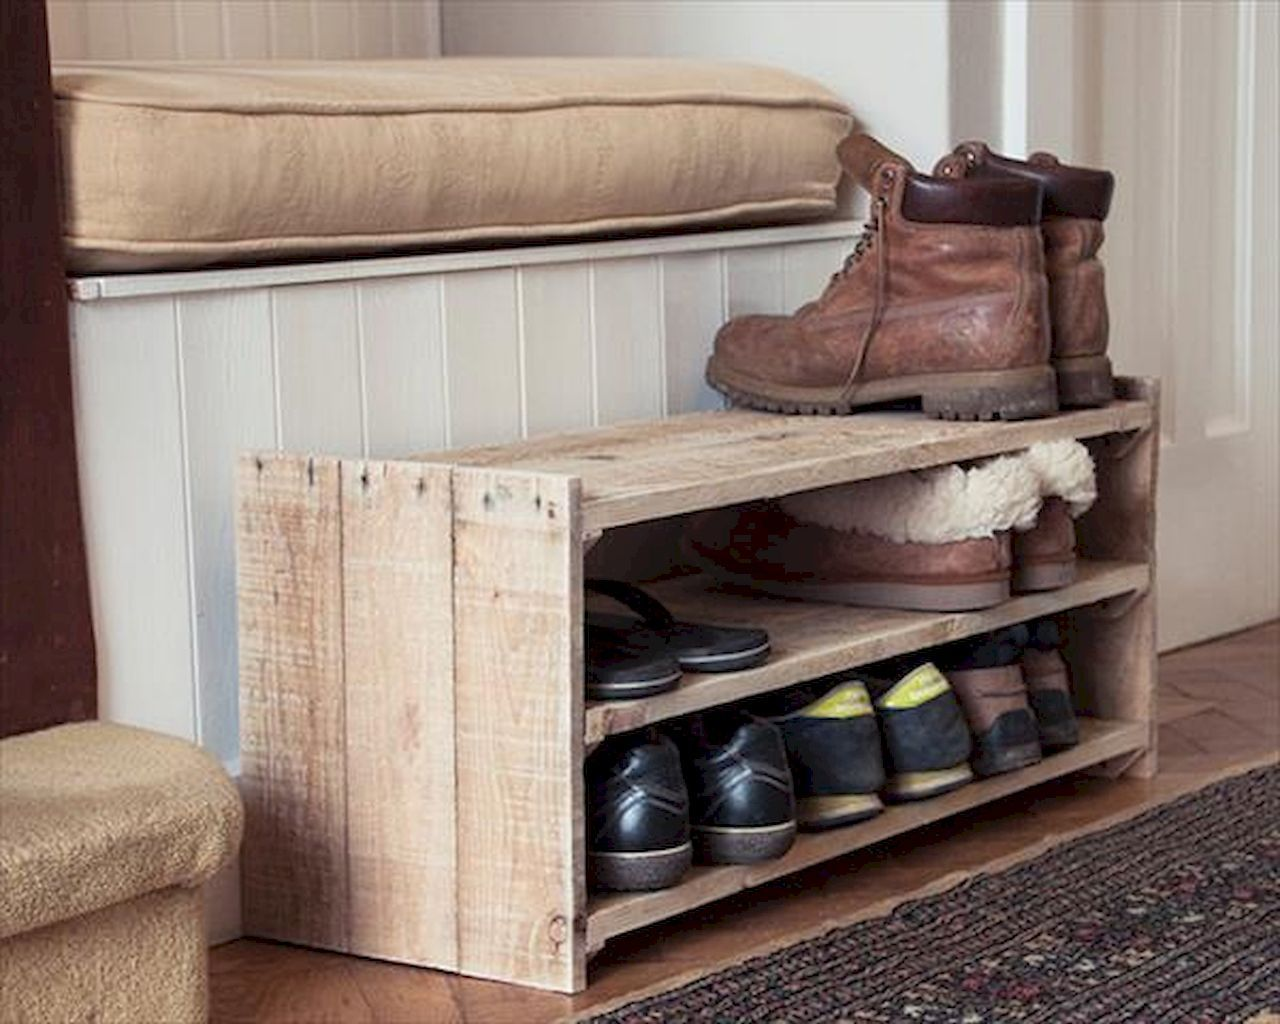 65 DIY Shoe Rack and Shelves Ideas